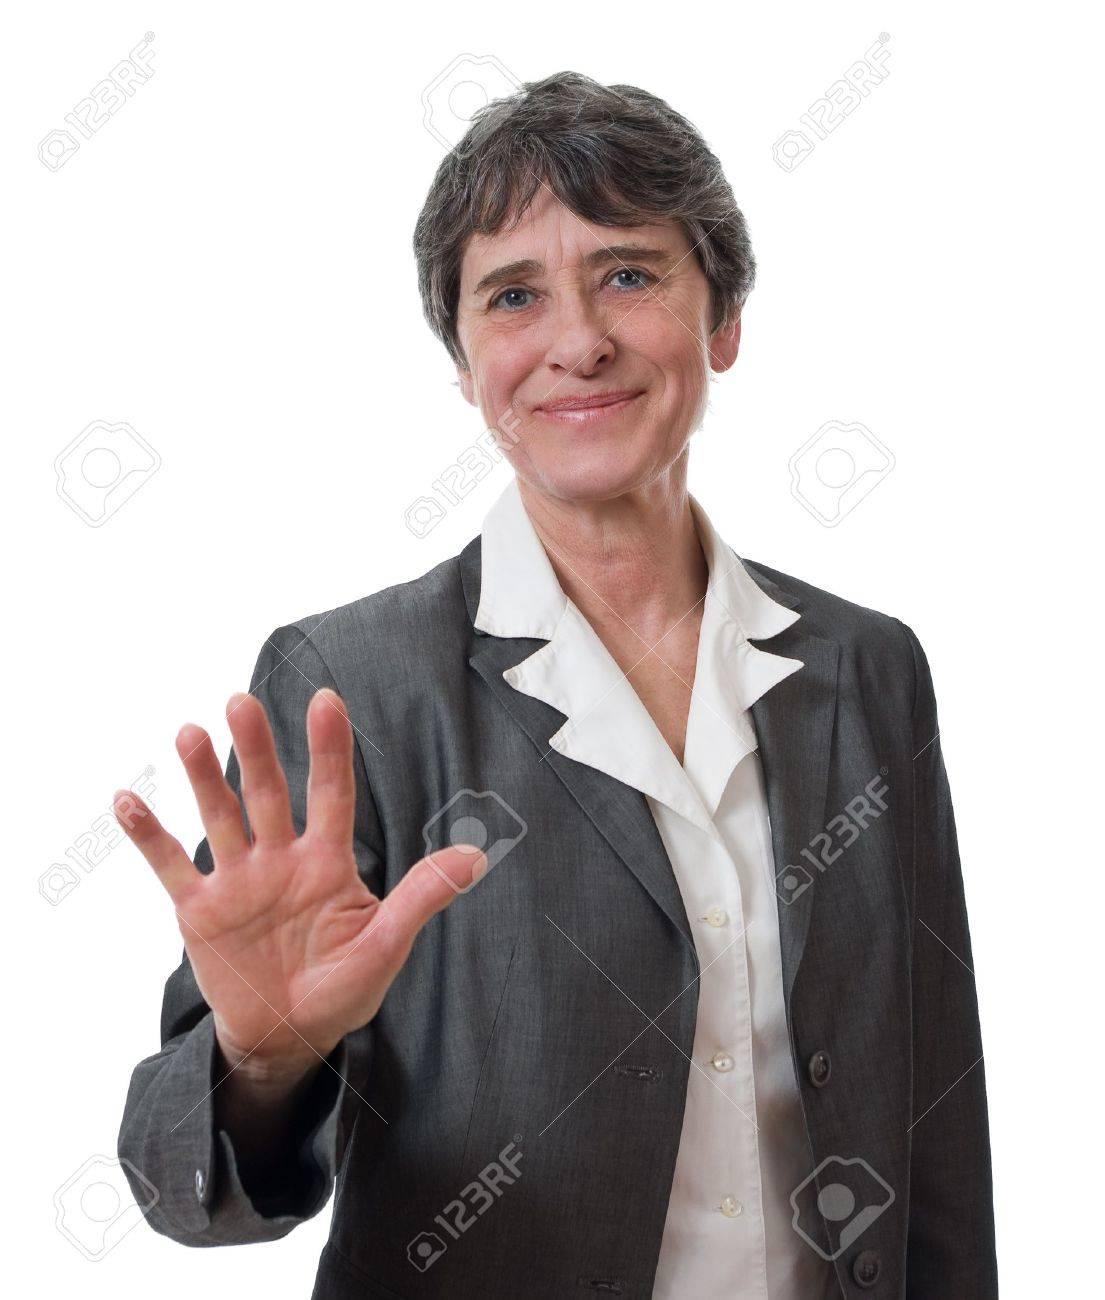 mature businesswoman refusing isolated on white background Stock Photo - 9077291